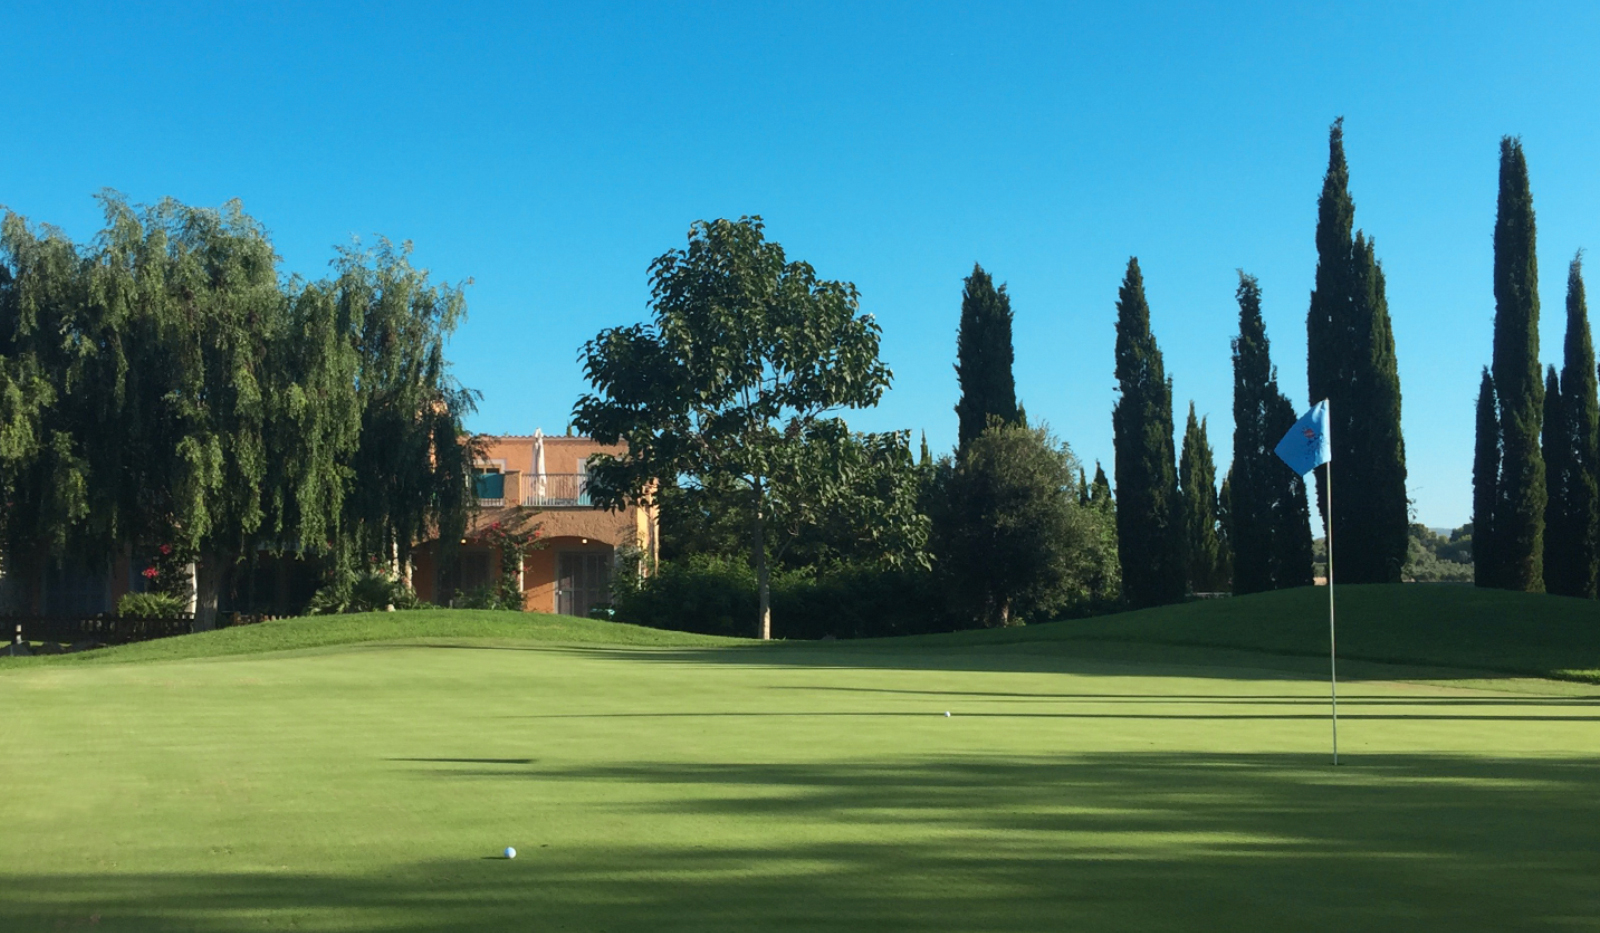 Pula Golf GolfnStyle Mallorca Golf Spielen - GOLF'n'STYLE - Silas - Pula Golf - Mallorca